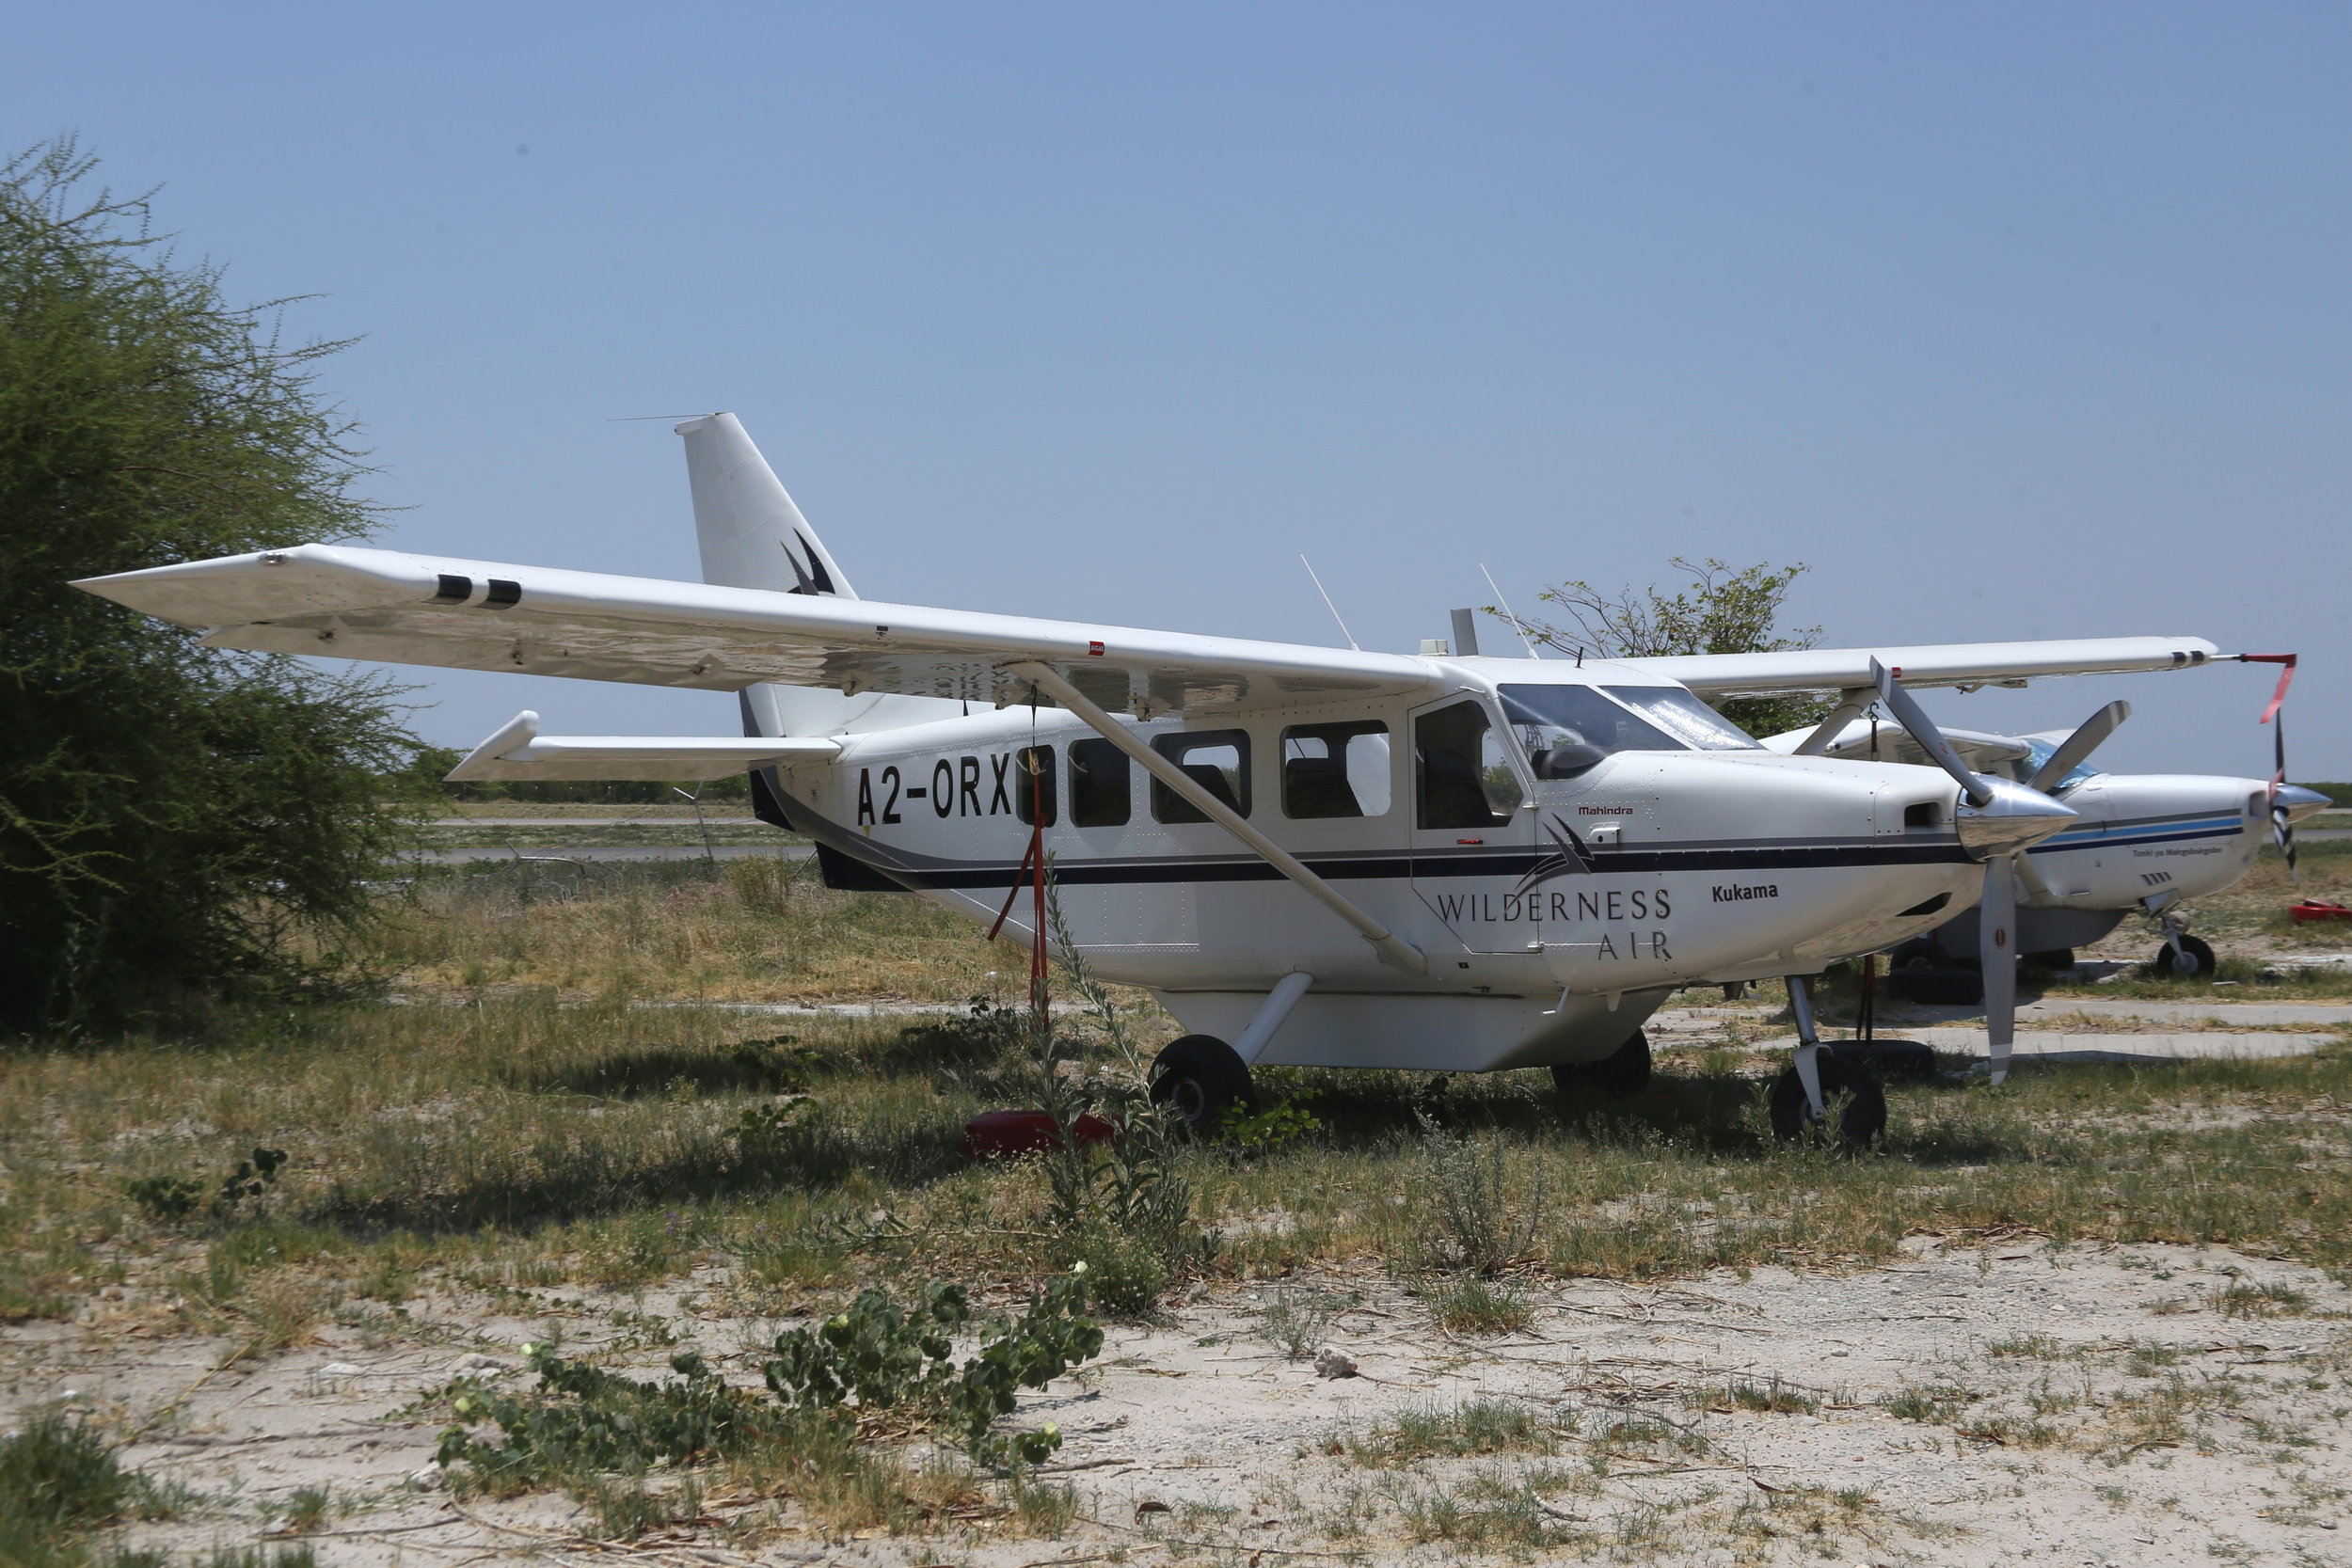 A2-ORX Wilderness Air Gippsland Airvan taken at Maun, Botswana 15th November 2018 by John Wood